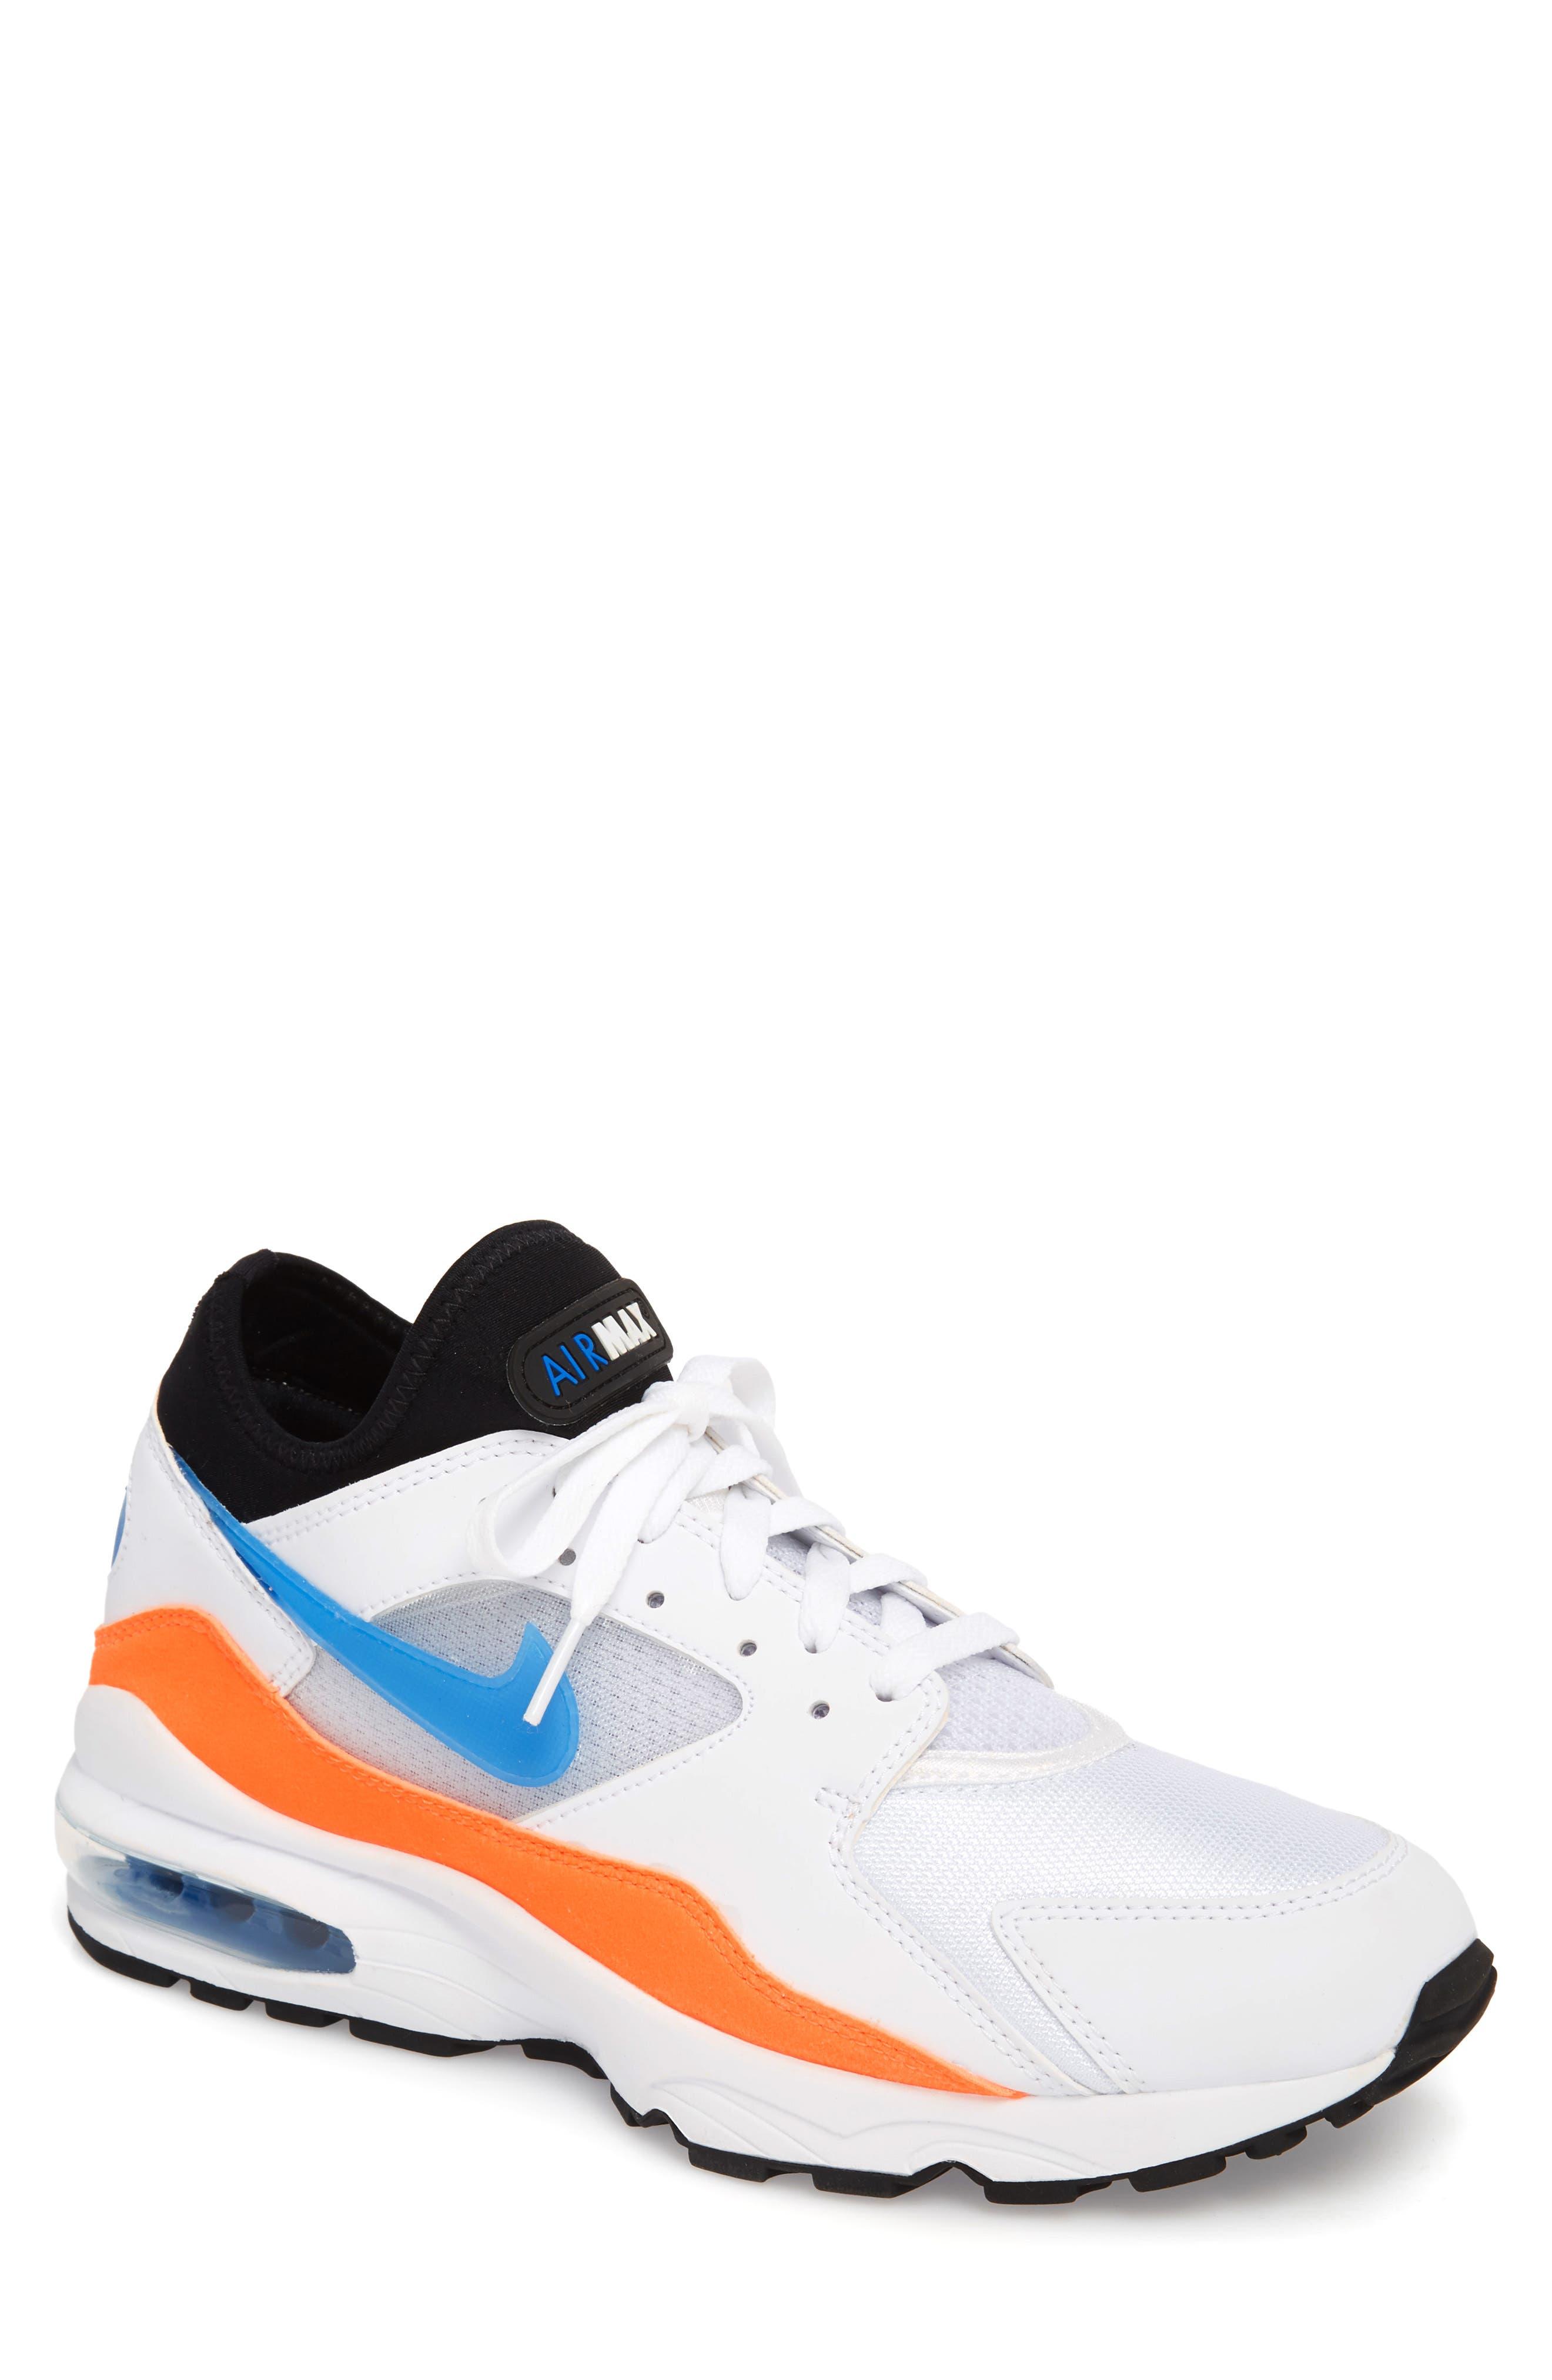 Air Max 93 Sneaker,                         Main,                         color, White/ Blue Nebula/ Orange